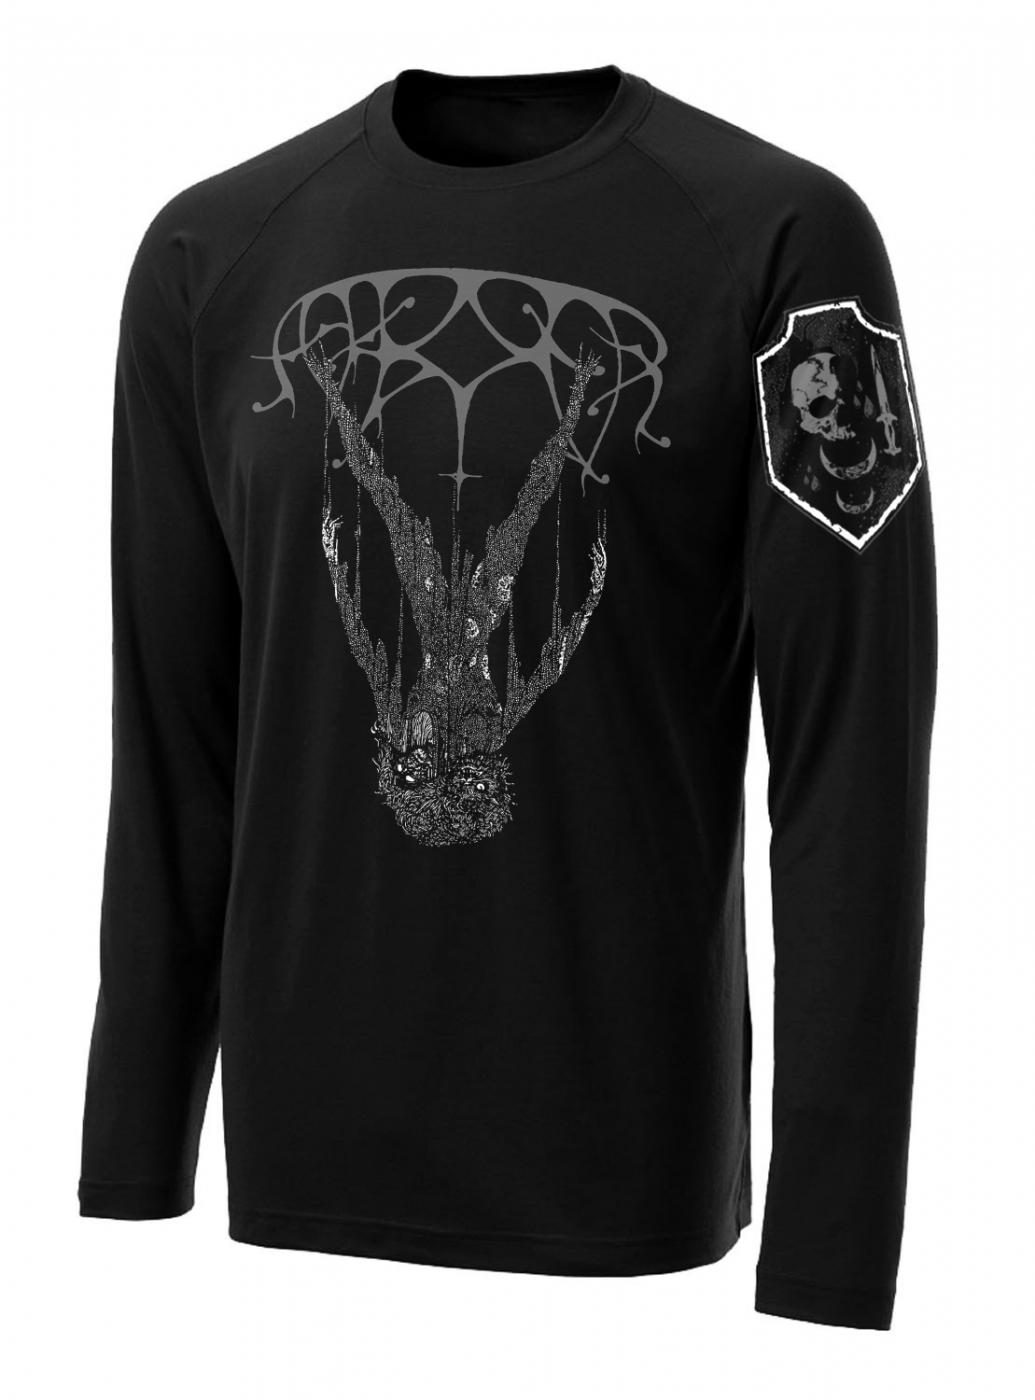 Ash Borer Merch Design Long Sleeve Tshirt Illustration Digital Illustration